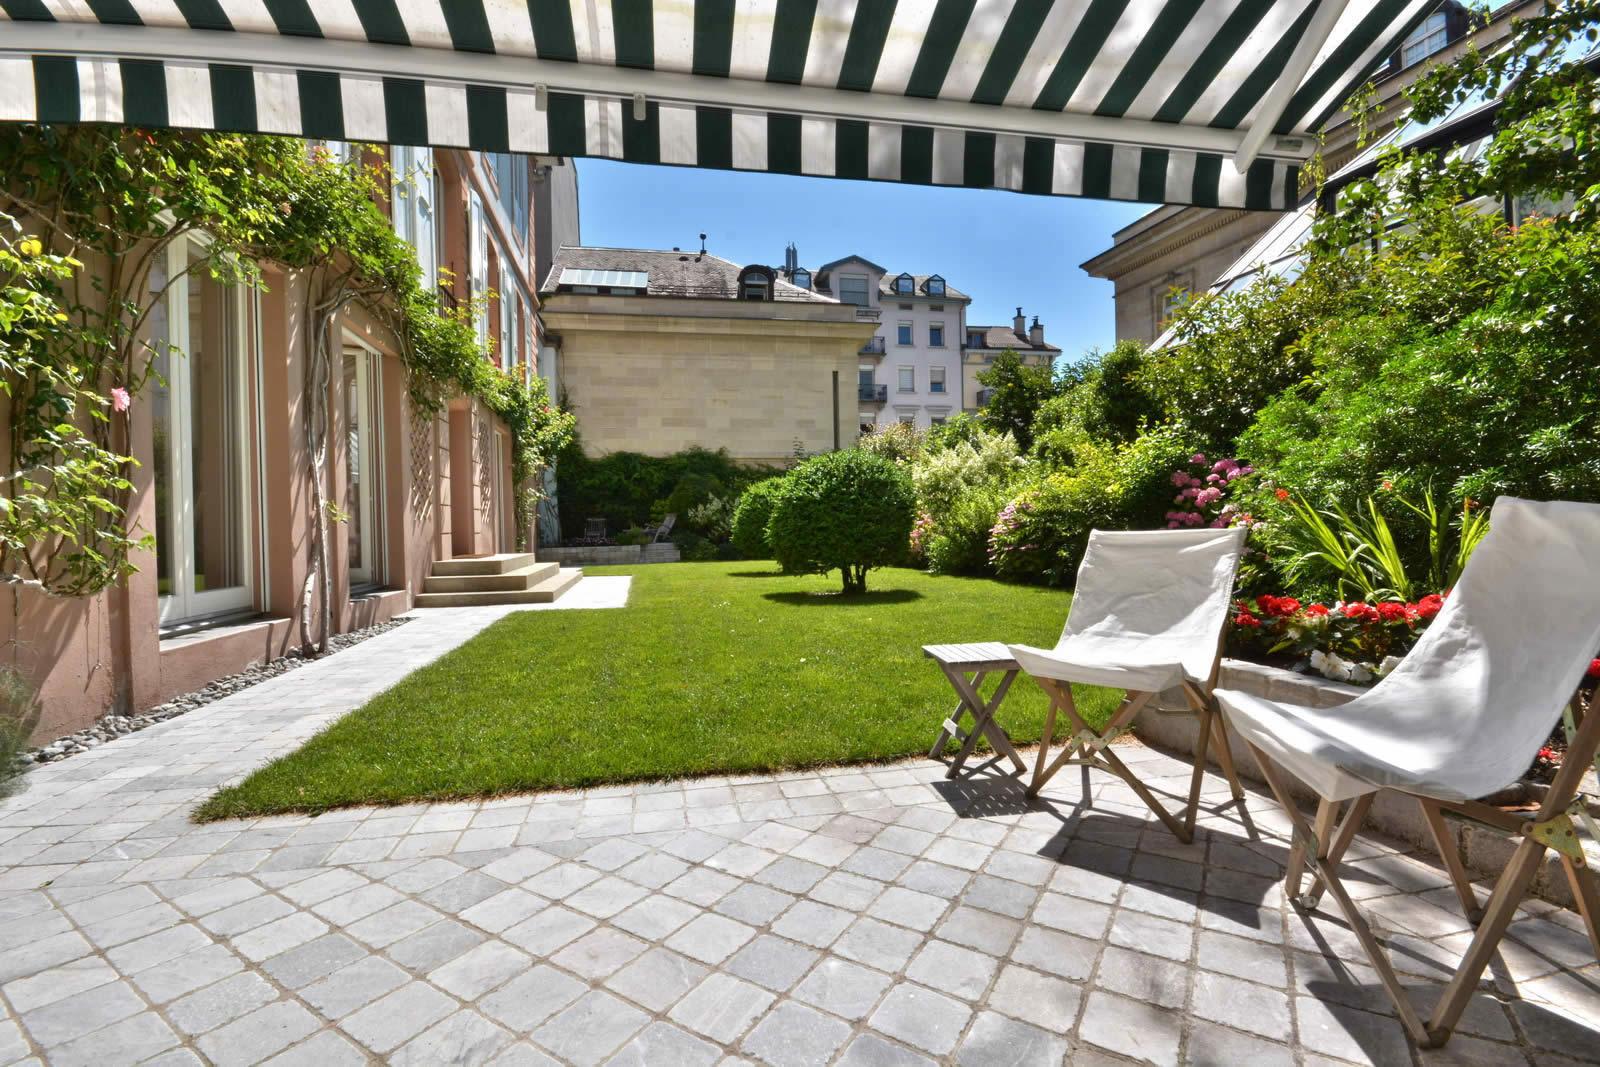 appartement-a-vendre-ancien-hotel-particulier-renove